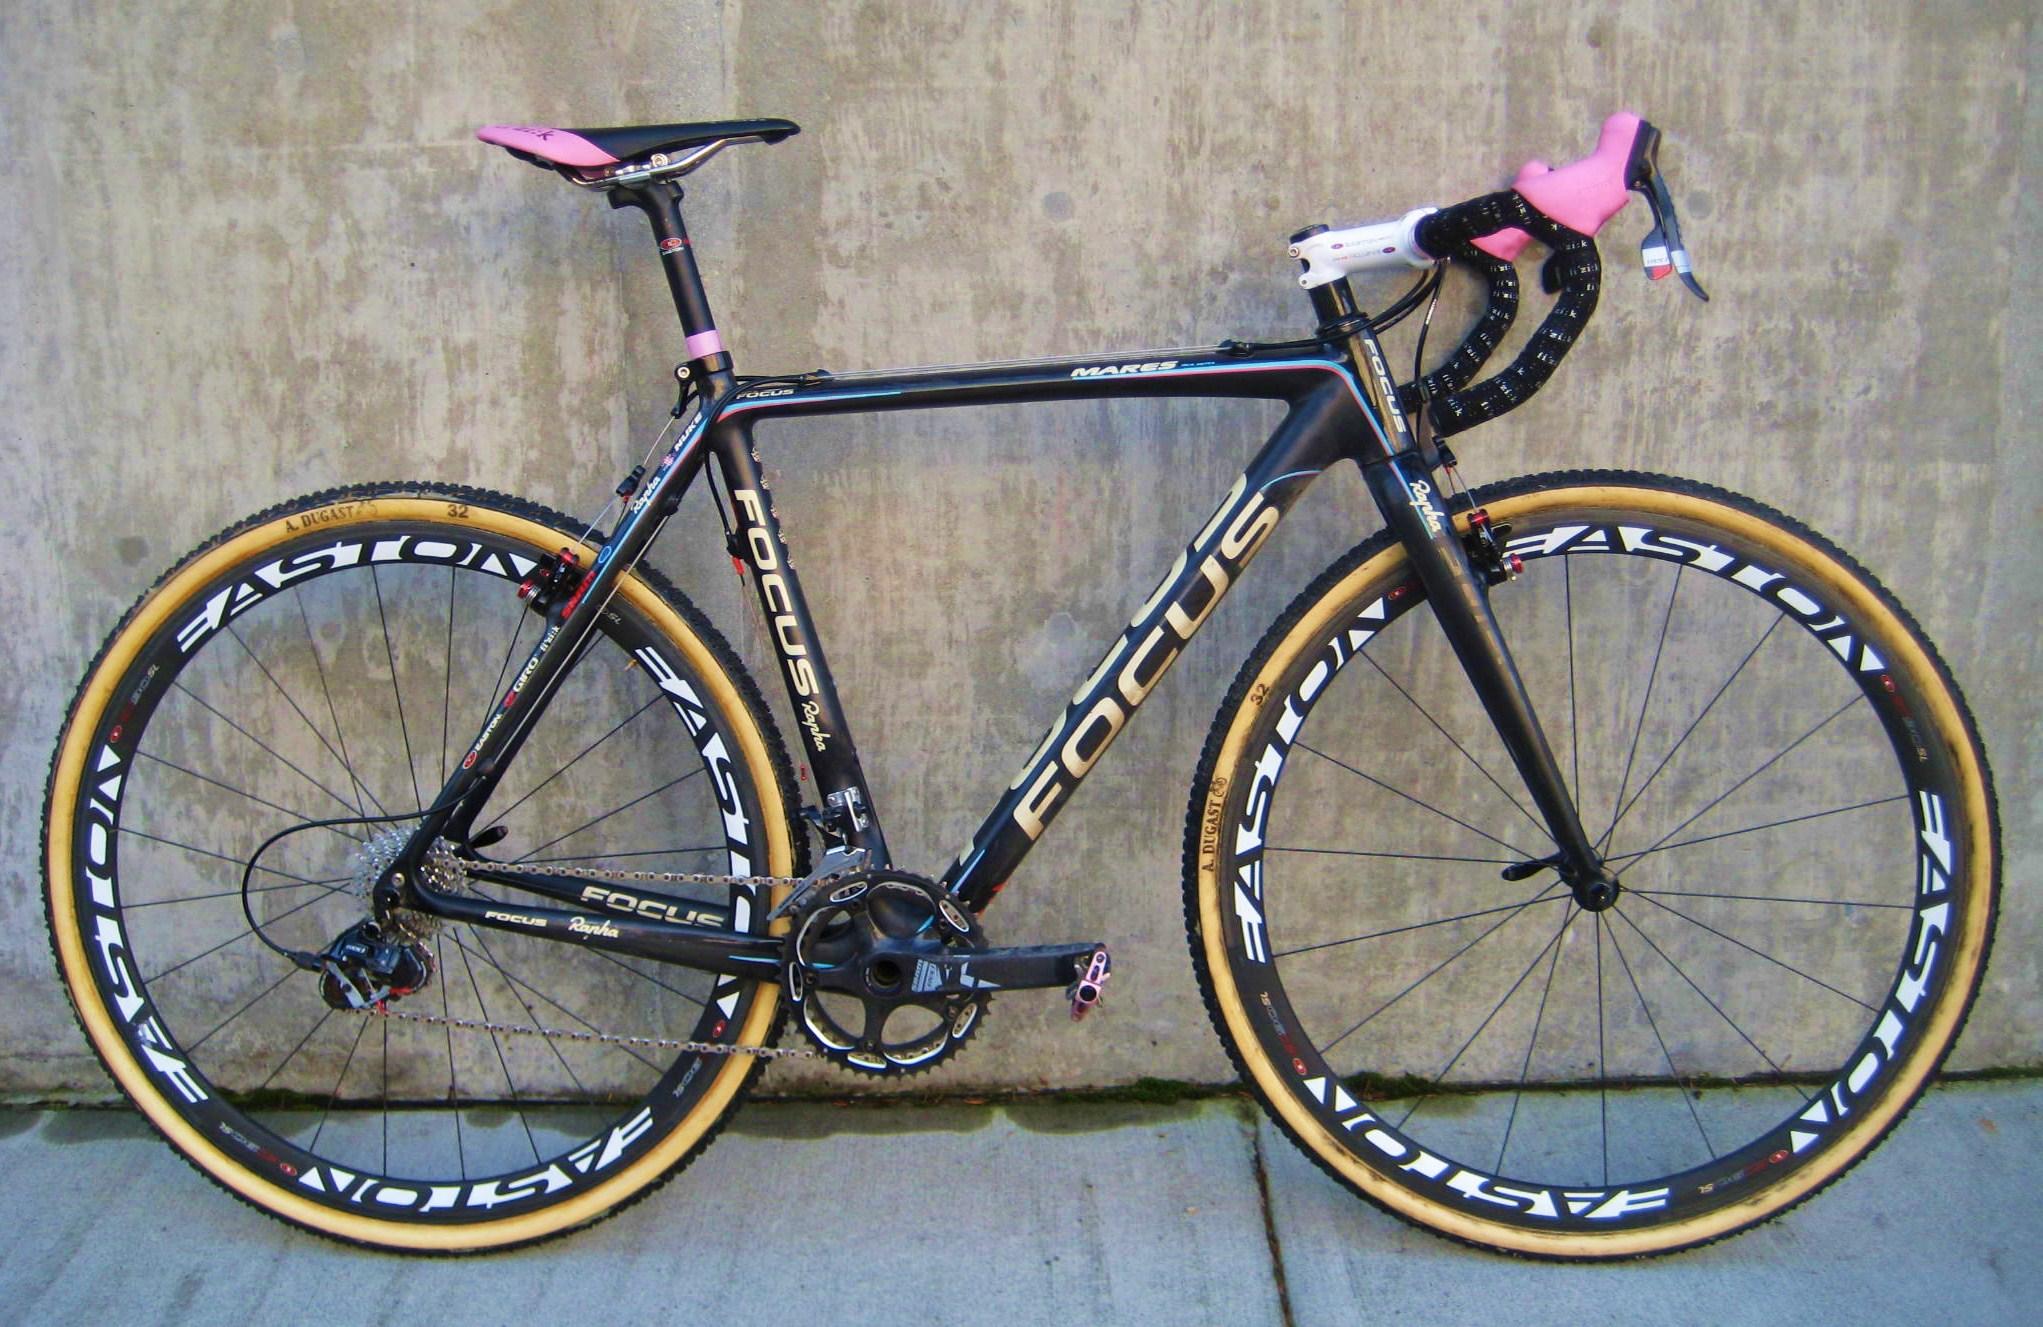 Zach McDonald s Rapha Focus team bike at Classic Cycle  66b714593